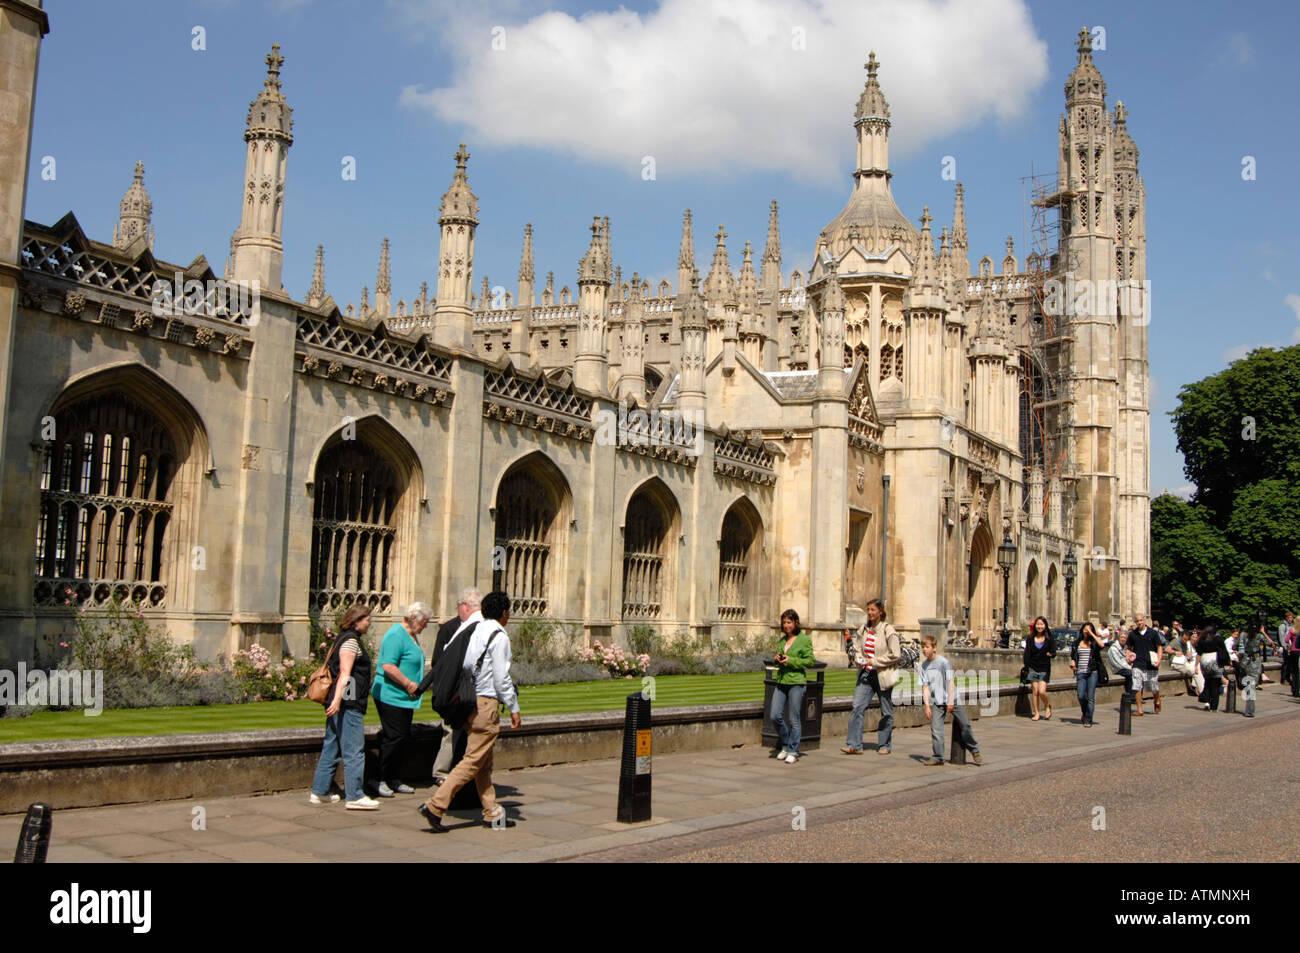 Kings College, Cambridge University - Stock Image